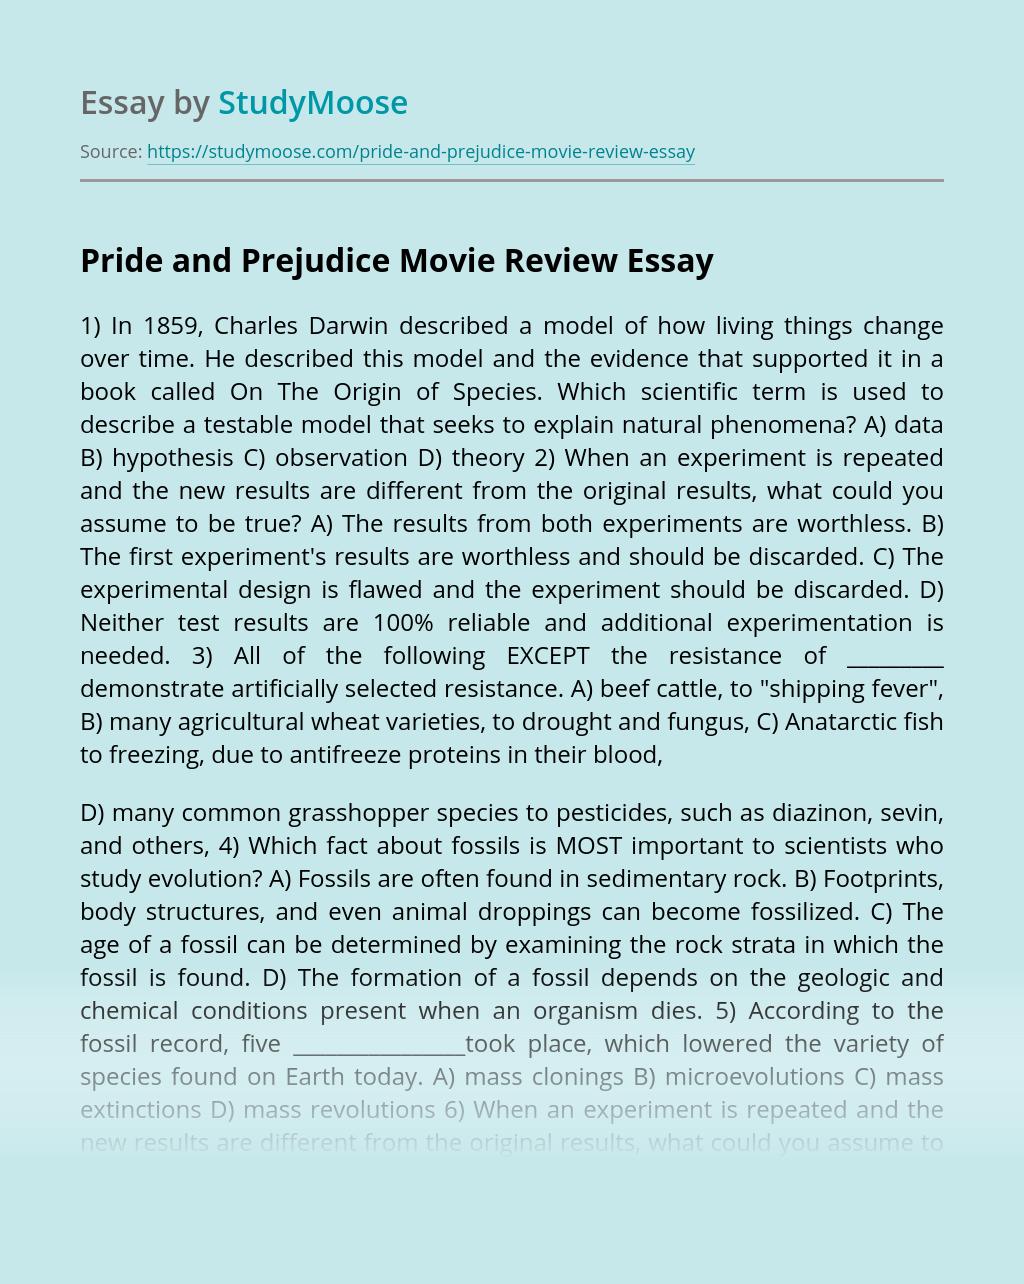 Pride and Prejudice Movie Review